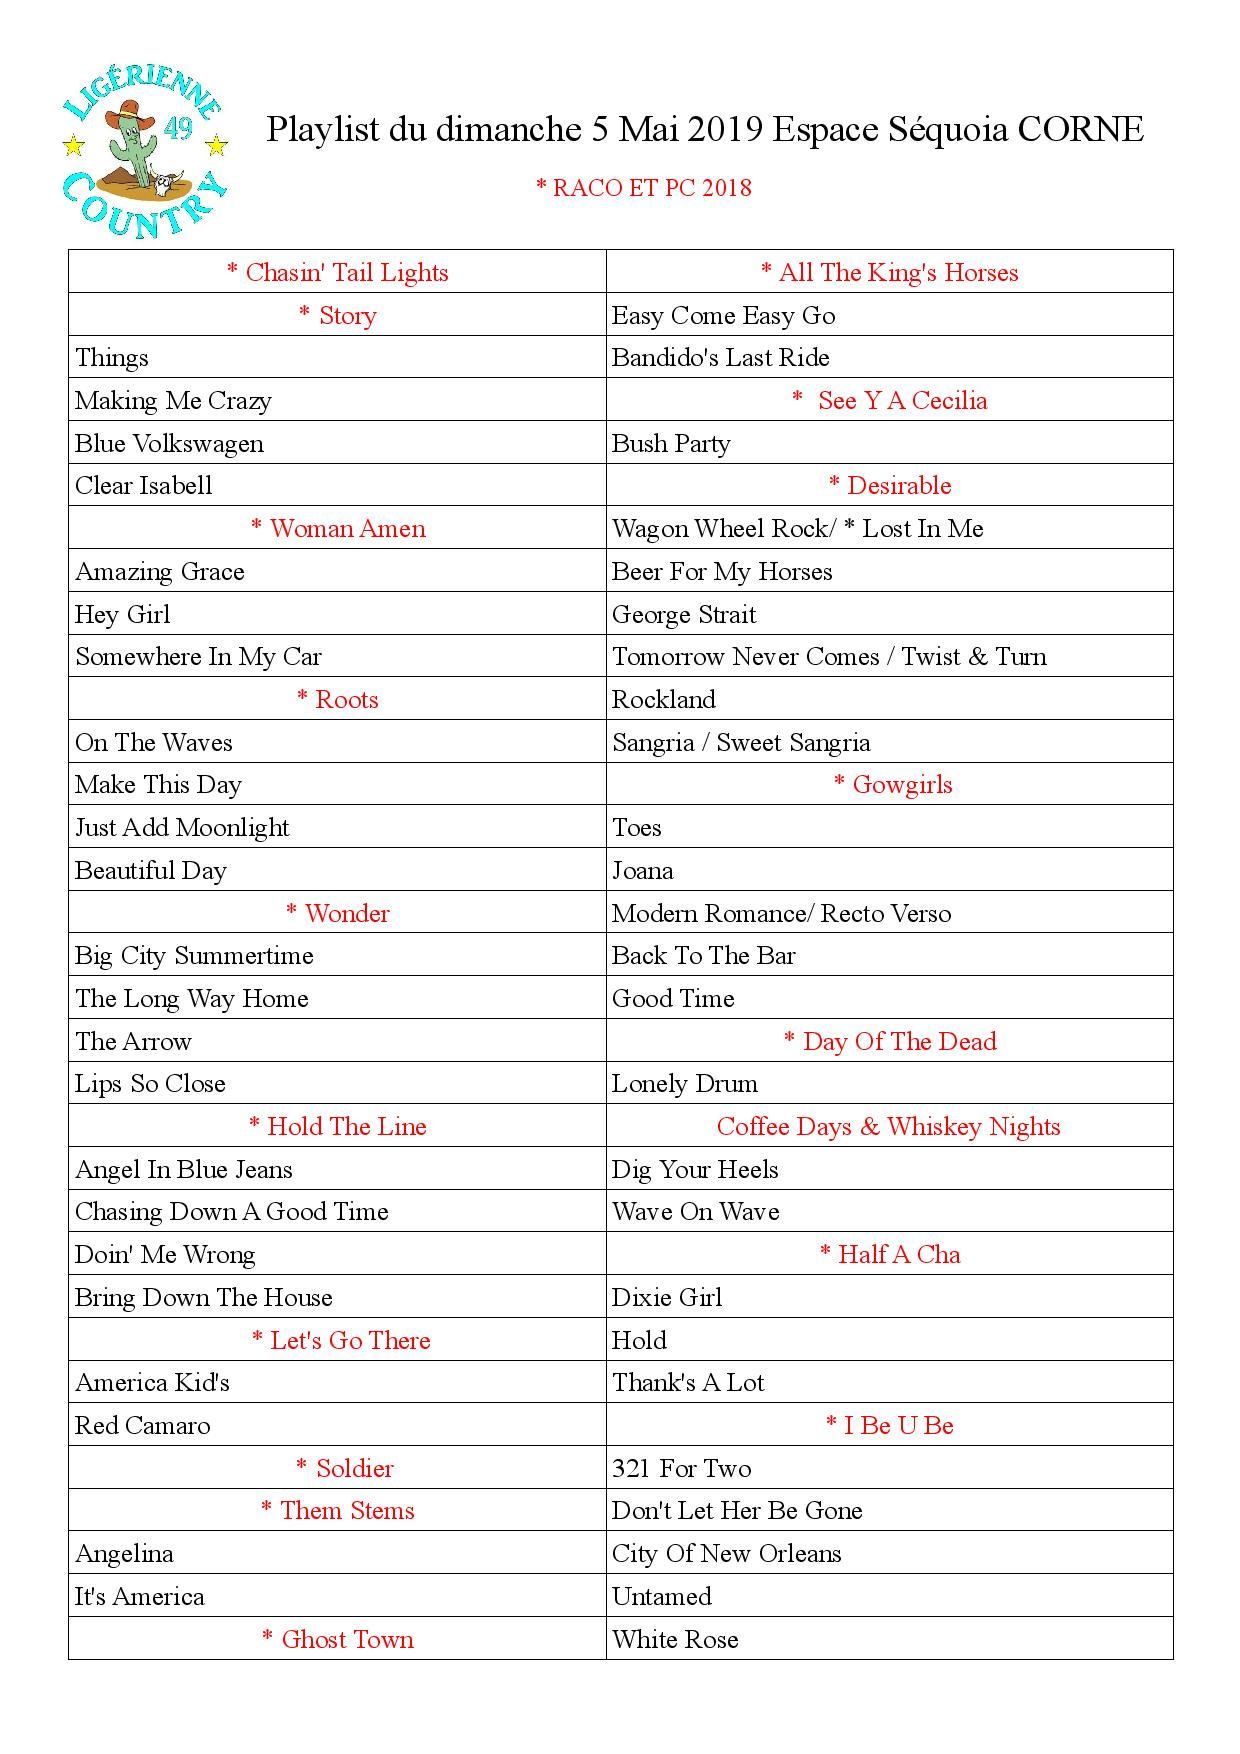 Playlist du 5 mai 2019-page-001 (1)